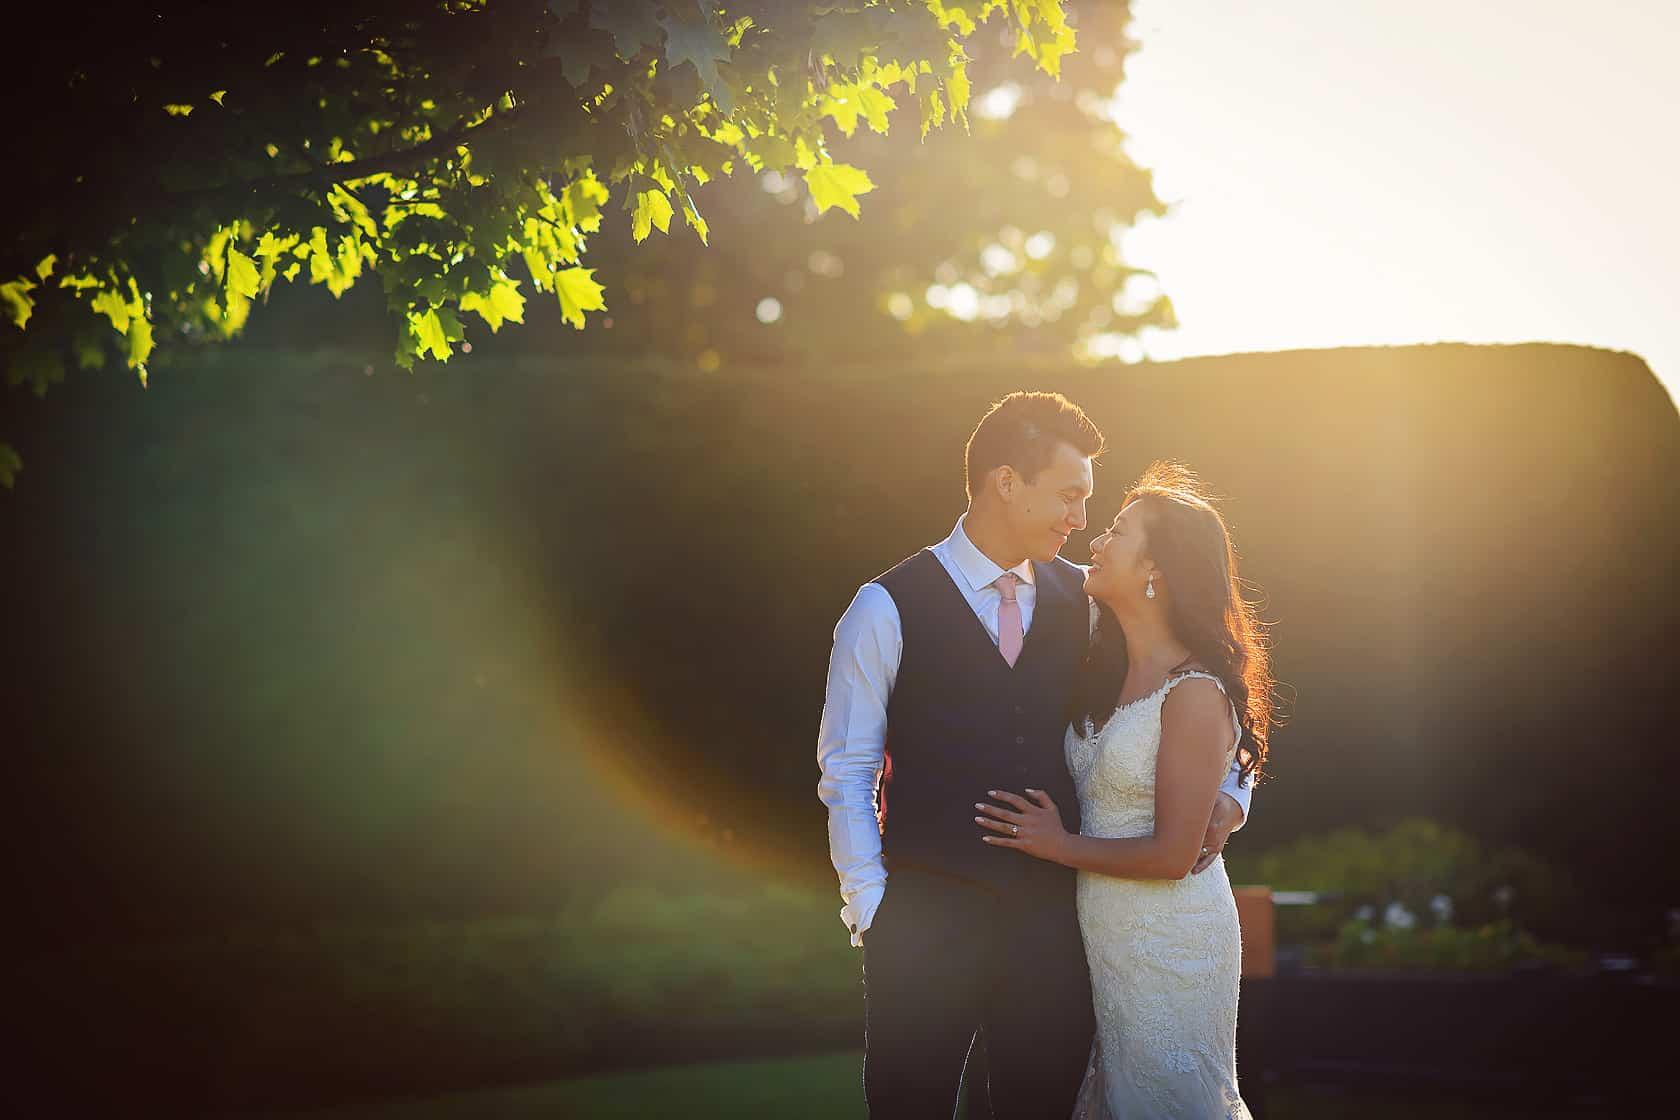 Best_Wedding_Photography_2018_Wedding-Photographer-Essex-and-London_044